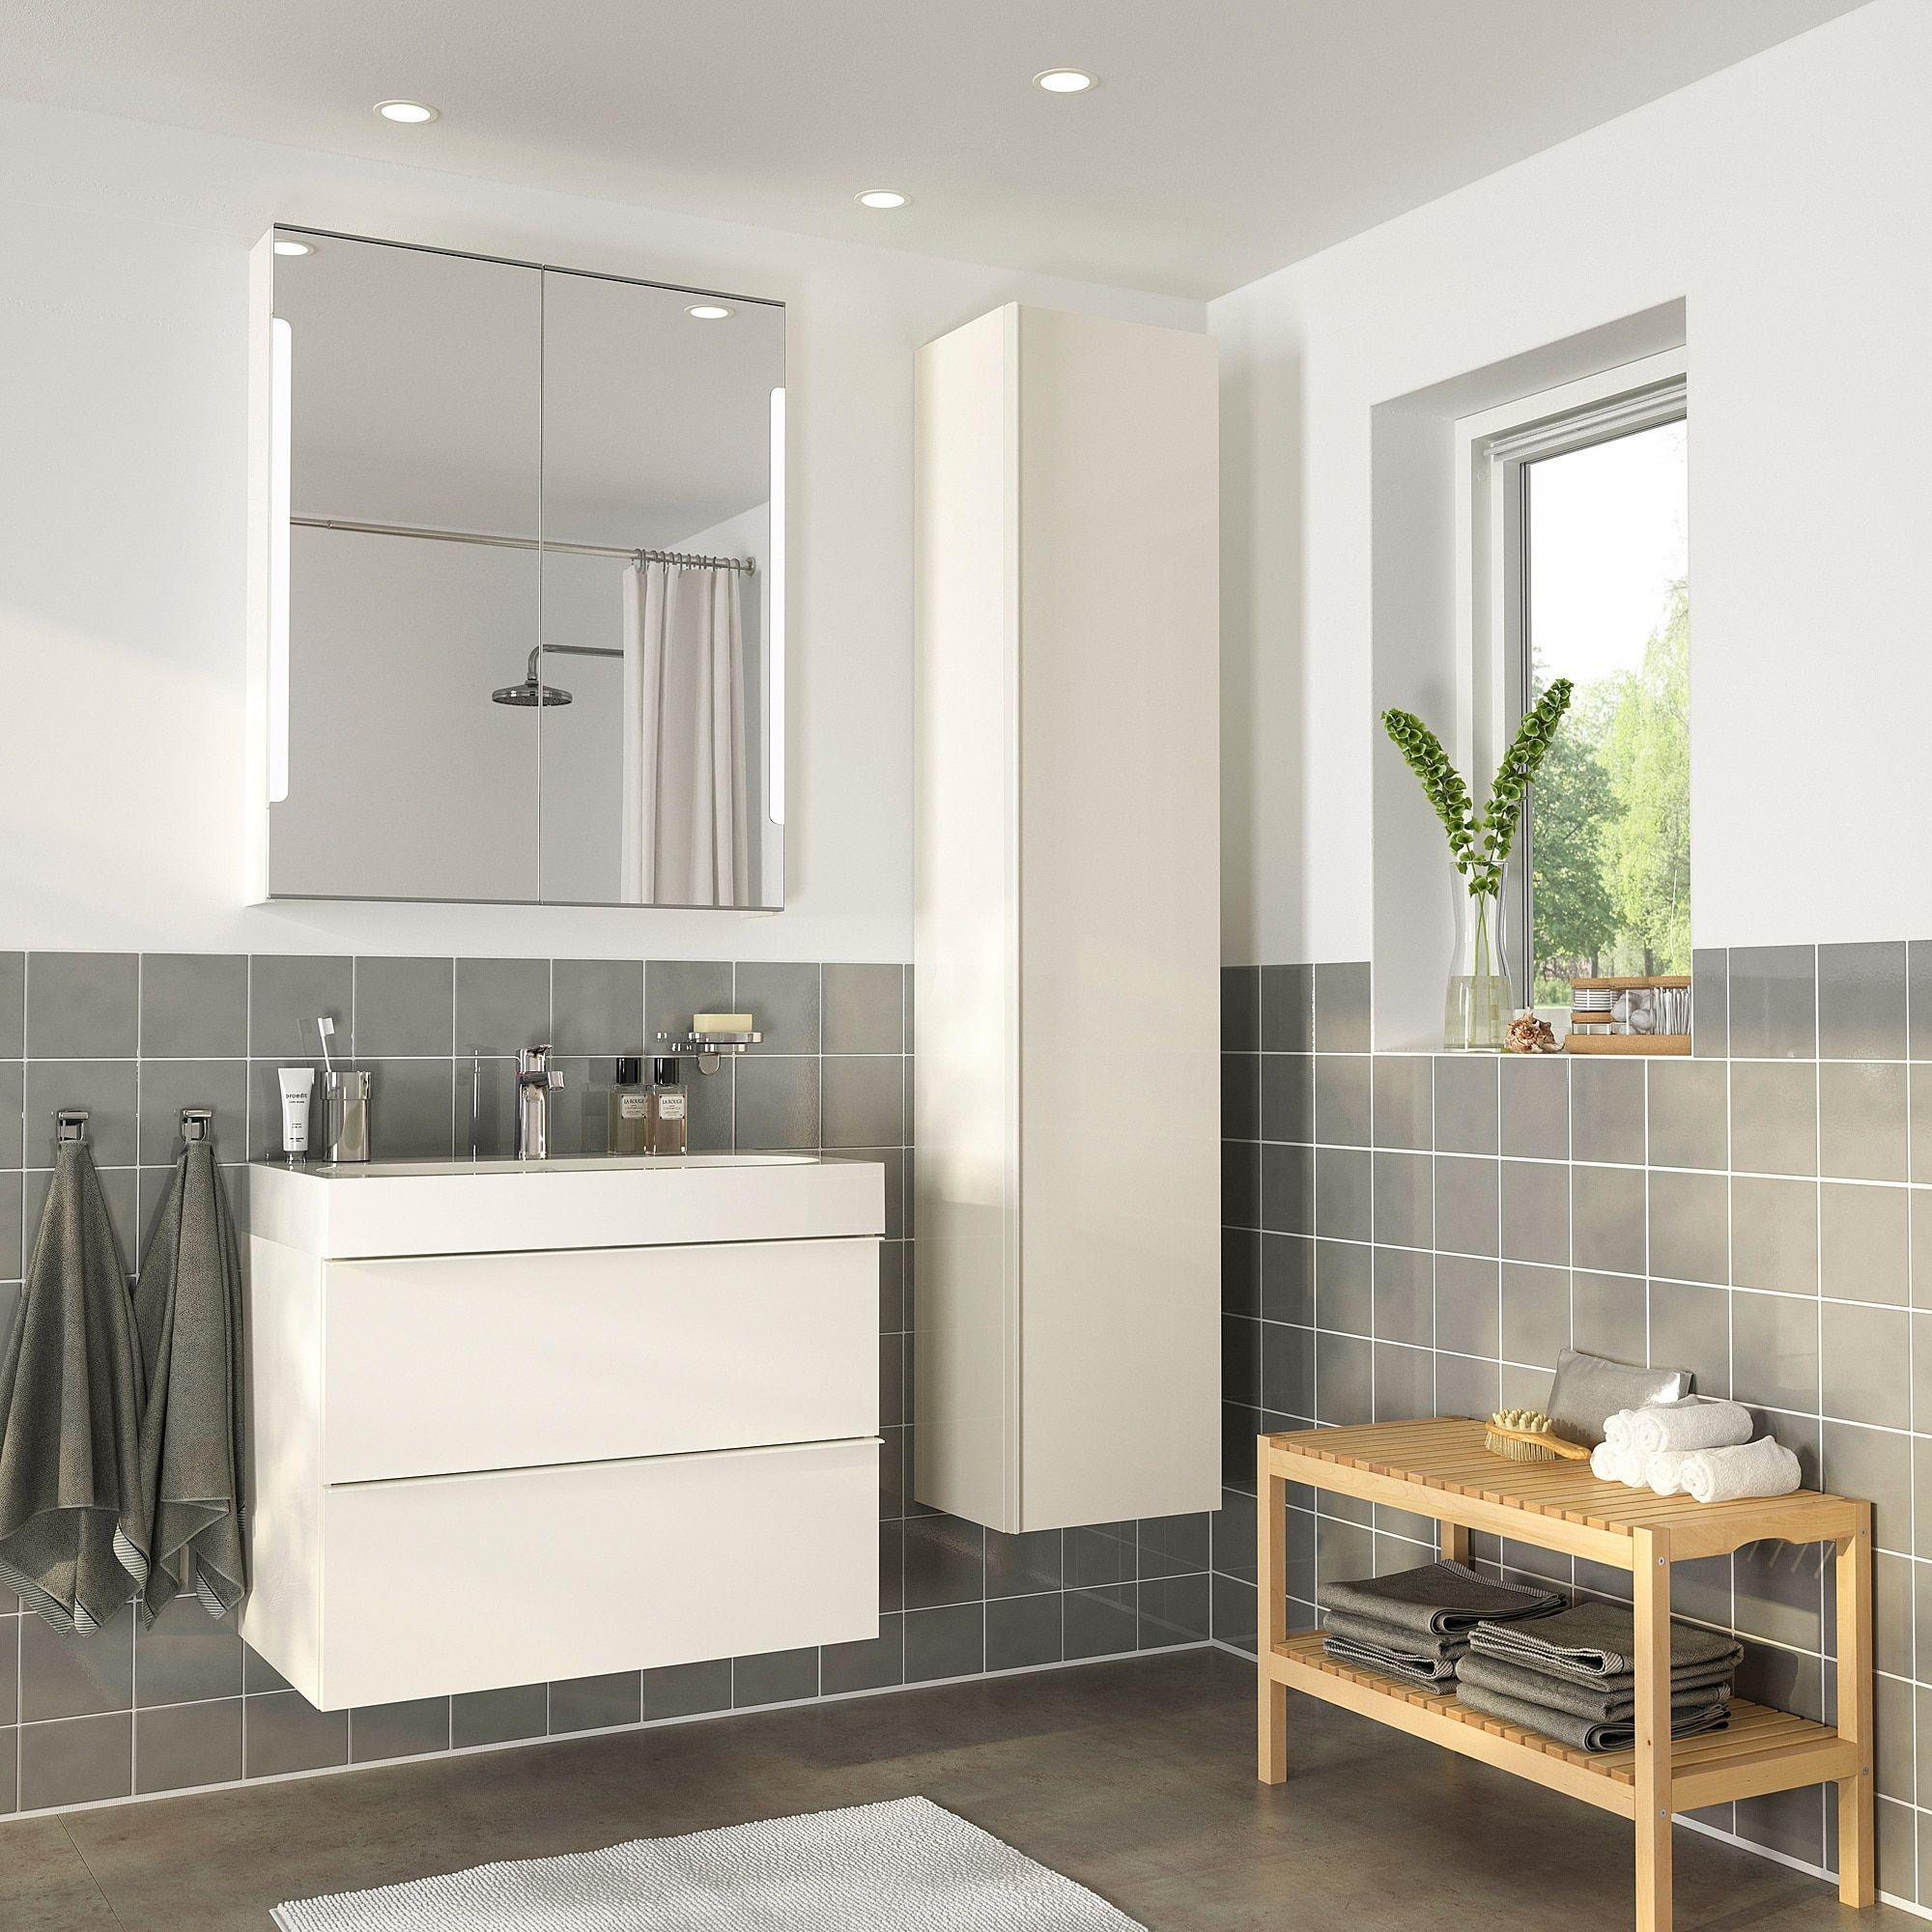 Godmorgon Braviken Bathroom Furniture Set Of 5 High Gloss White Brogrund Faucet Ikea In 2020 Bathroom Furniture Bathroom Furniture Sets White Vanity Bathroom